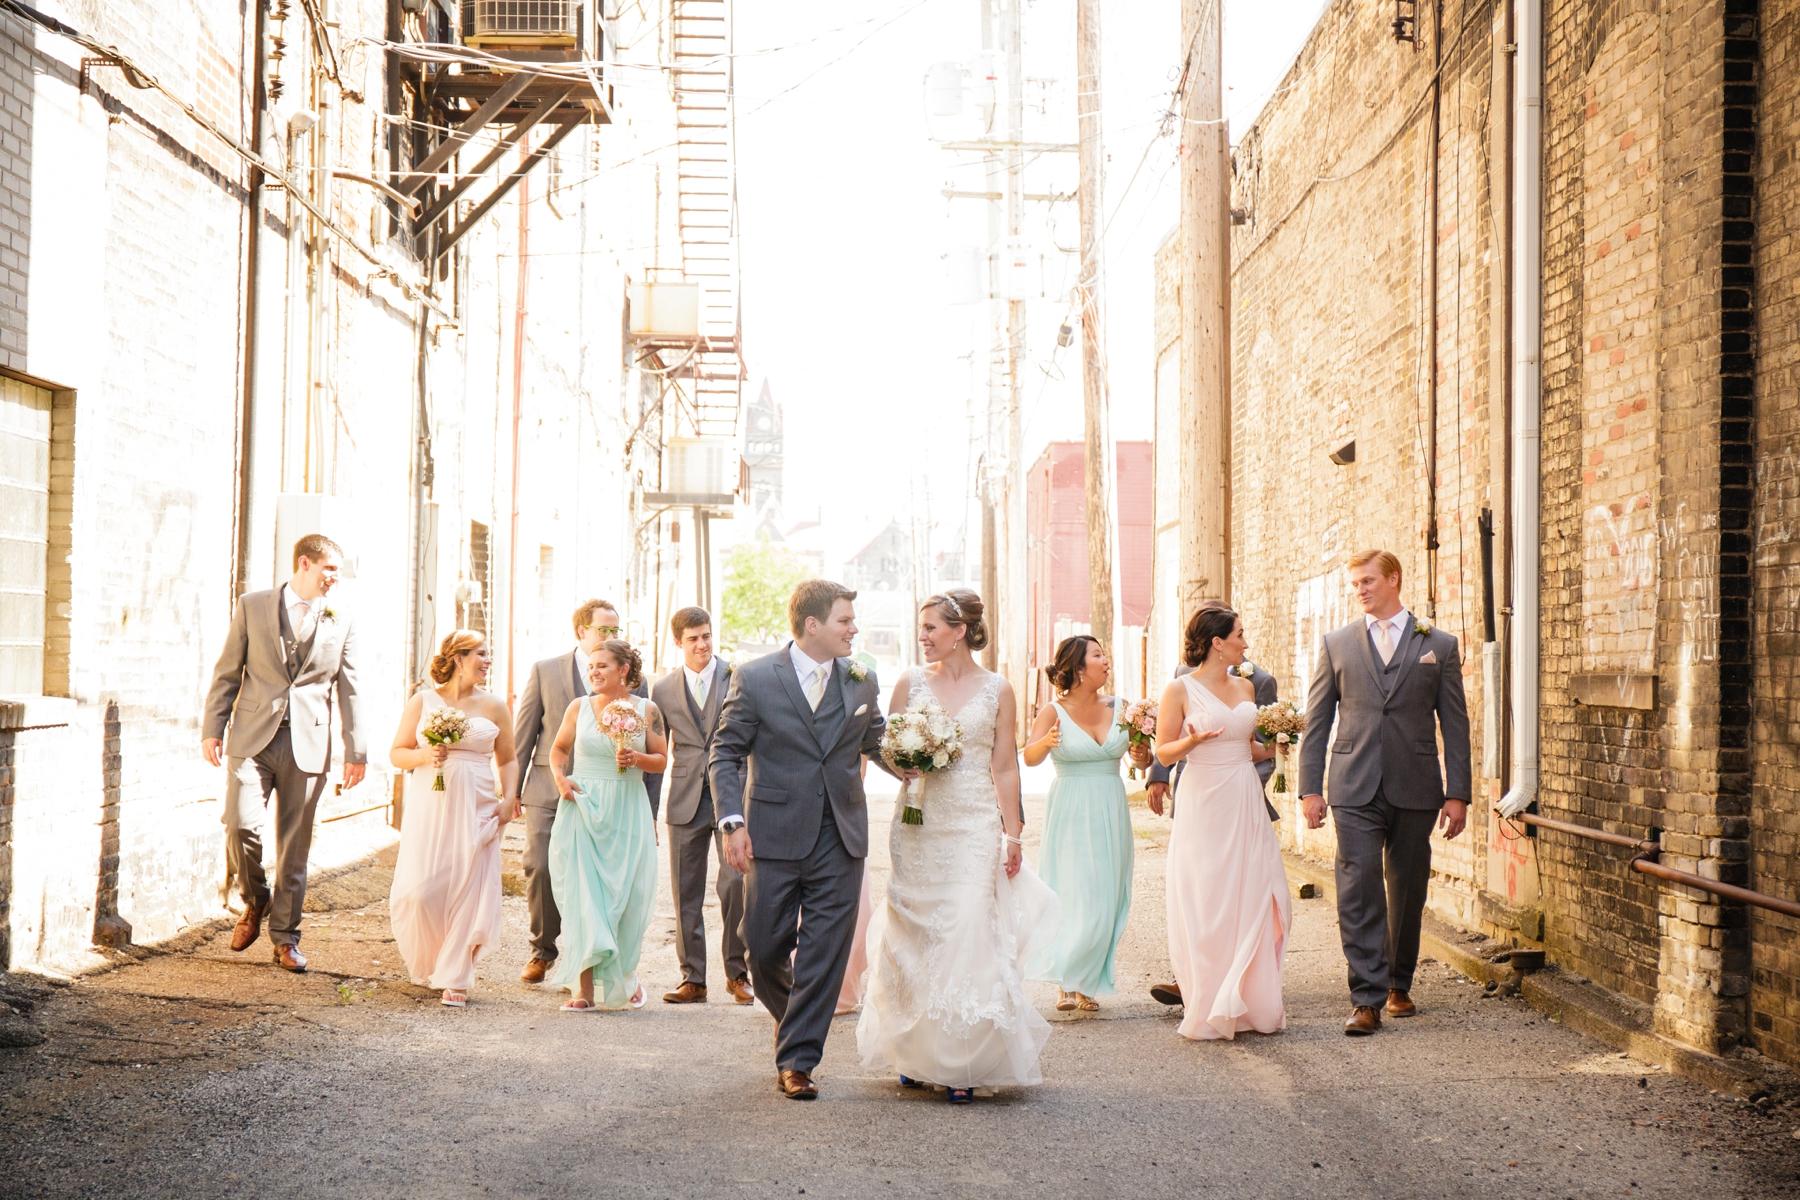 Ben_Jillian_Midland_Baycity_Wedding_0058.jpg